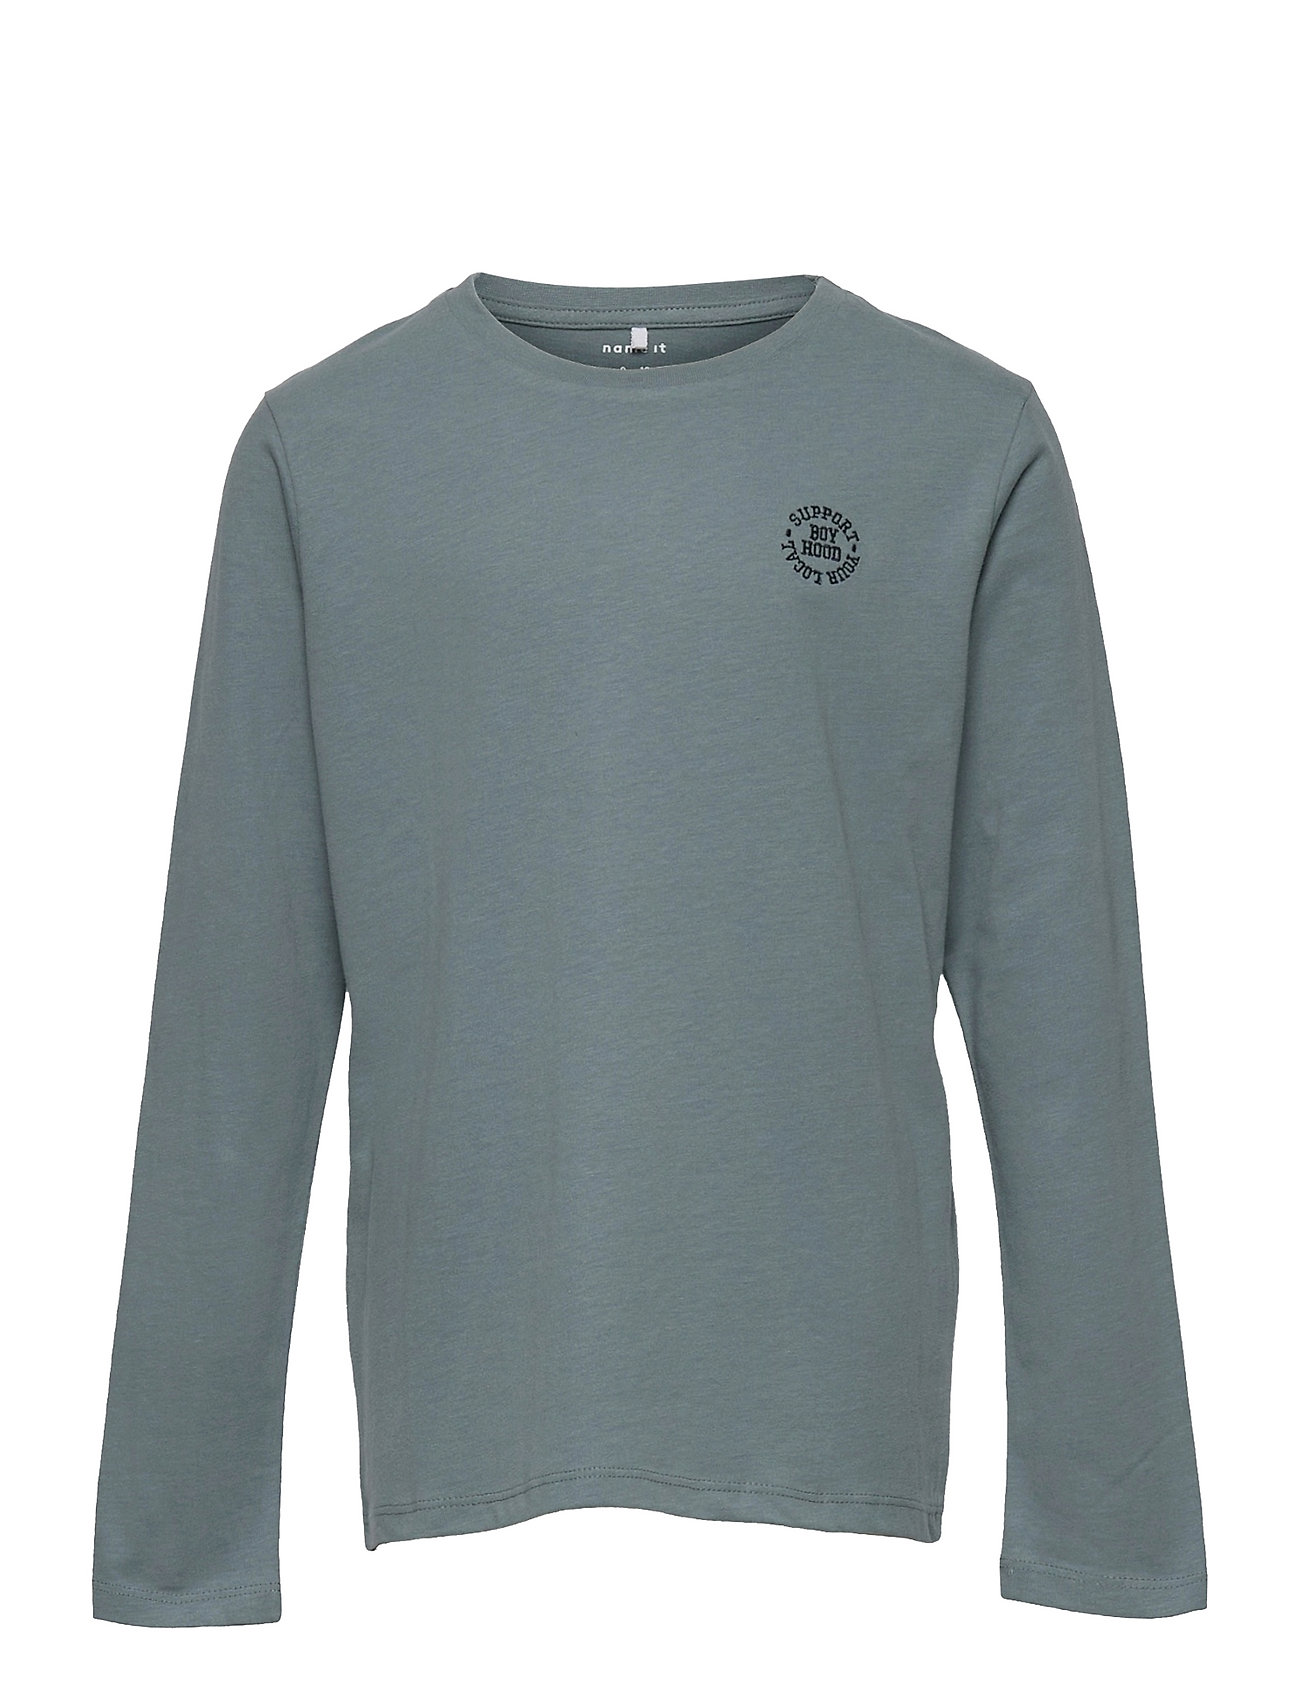 Nkmtano Ls Top Langærmet T-shirt Blå Name It